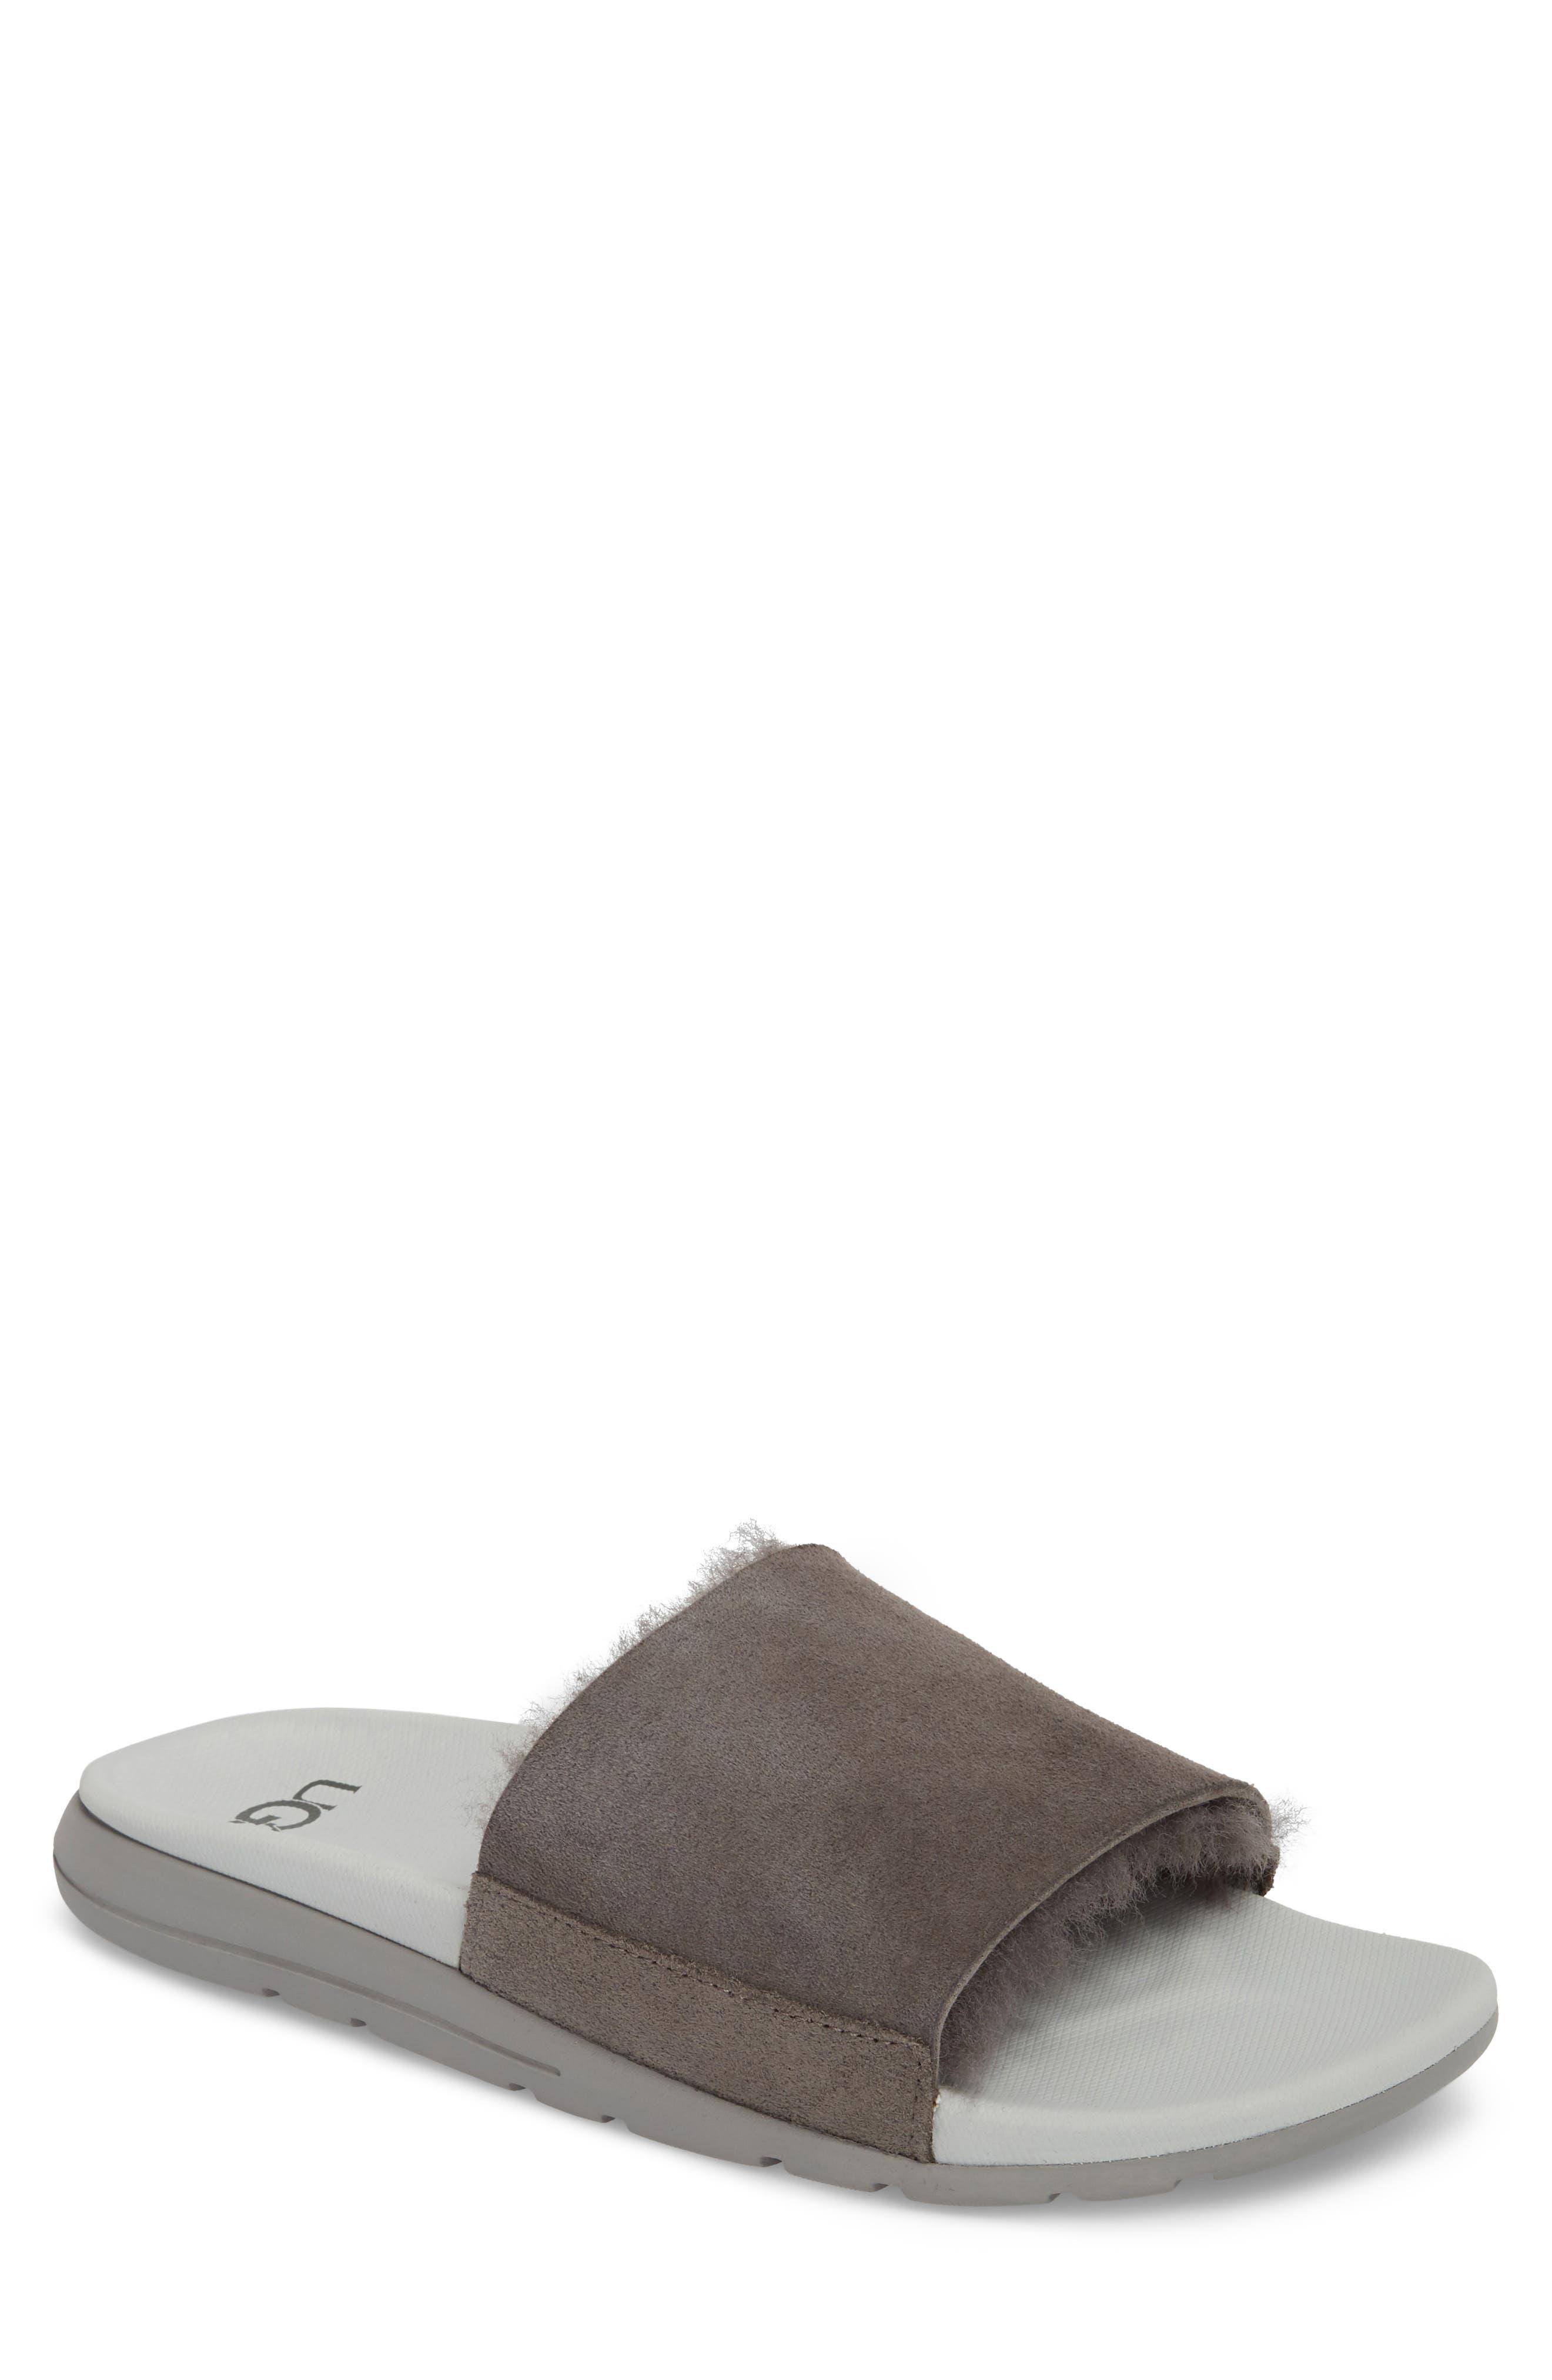 1ec97bbc9cb Ugg Xavier Tf Genuine Shearling Slide Sandal In Charcoal Leather ...